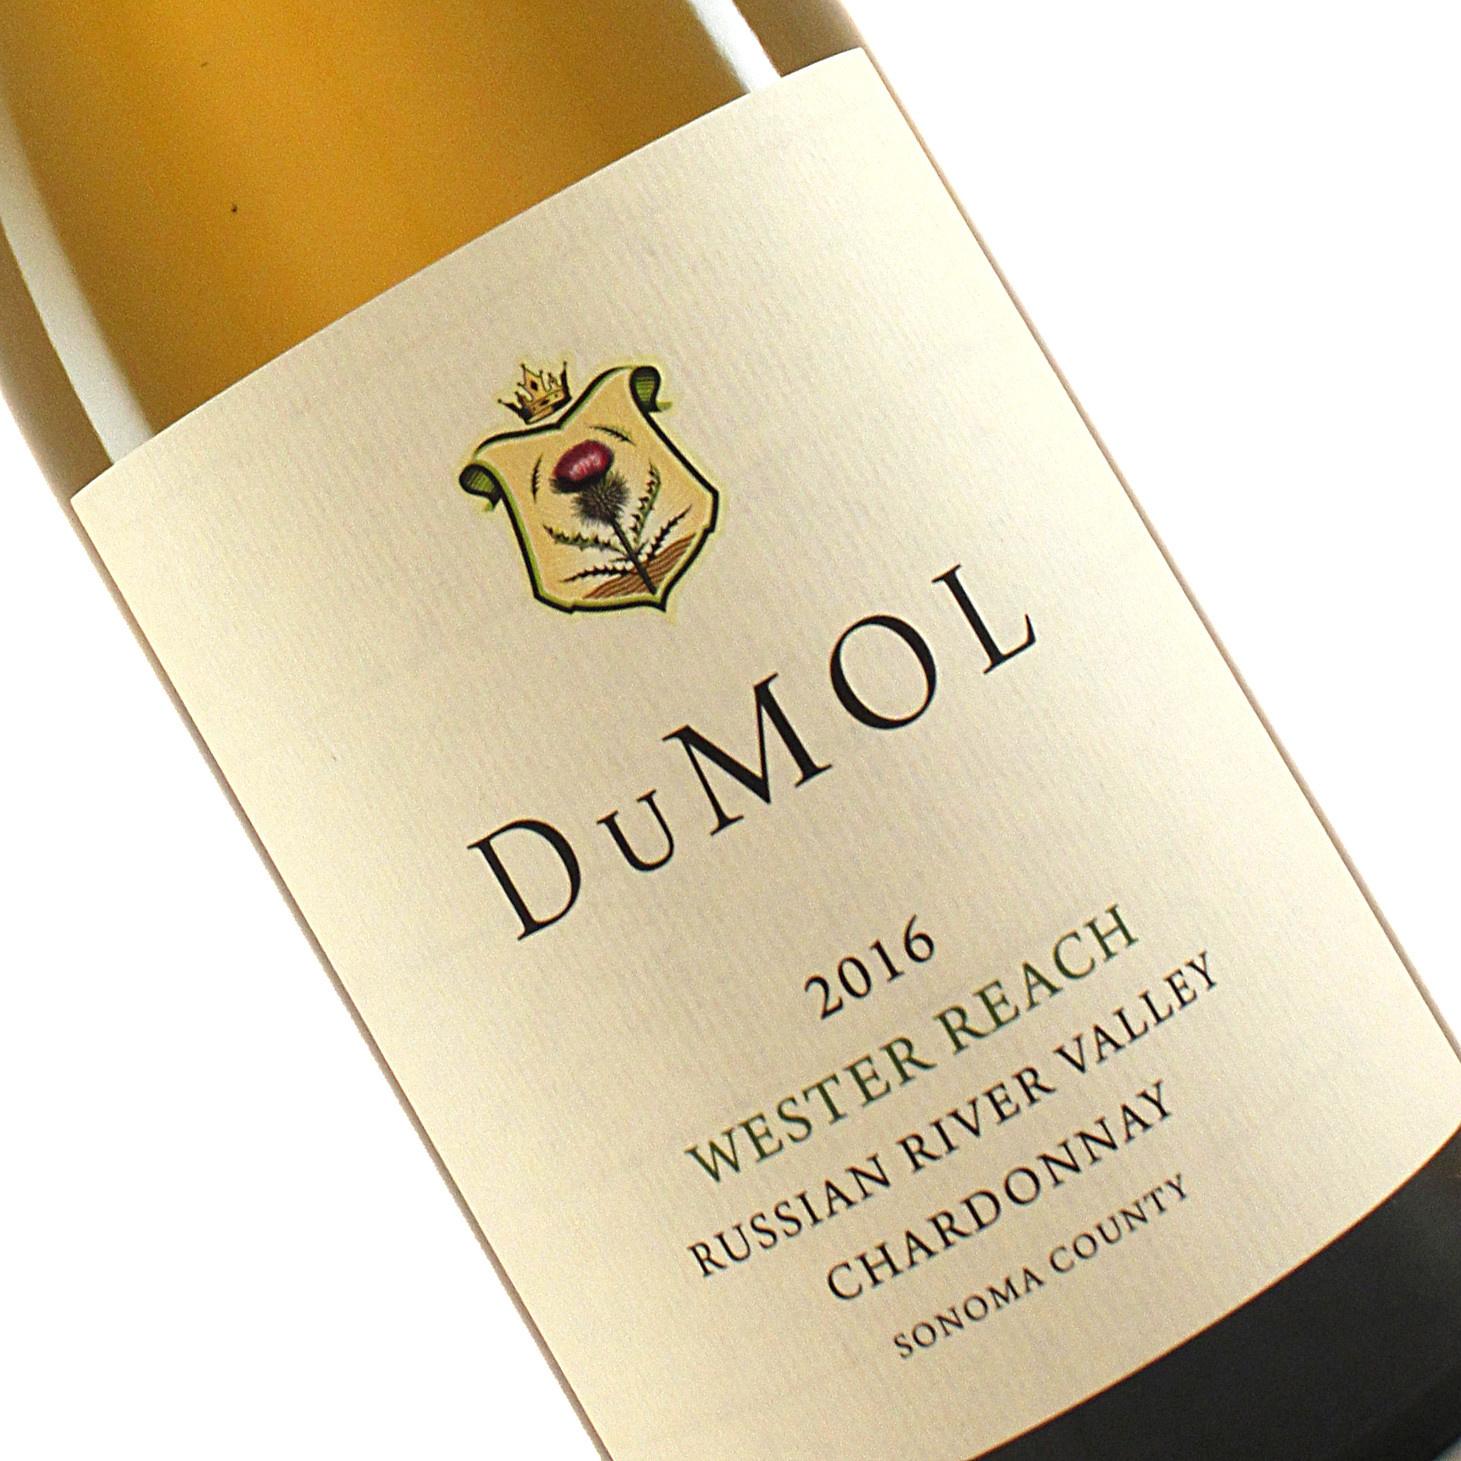 DuMOL 2016 Chardonnay Wester Reach, Russian River Valley